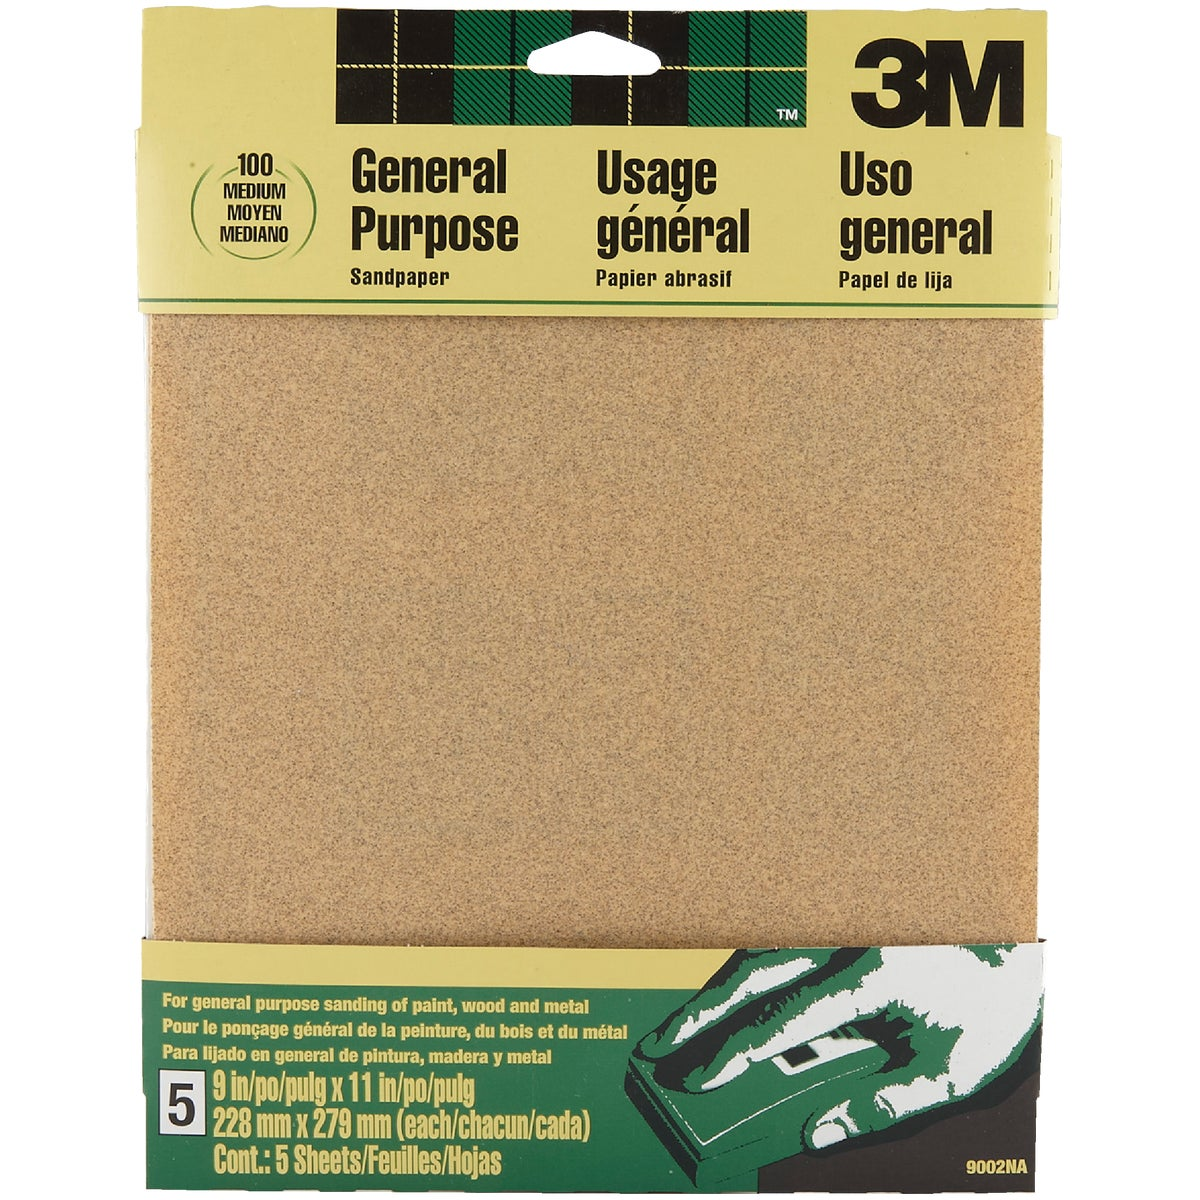 3M General -Purpose 9 In. x 11 In. 100 Grit Medium Sandpaper (5-Pack)